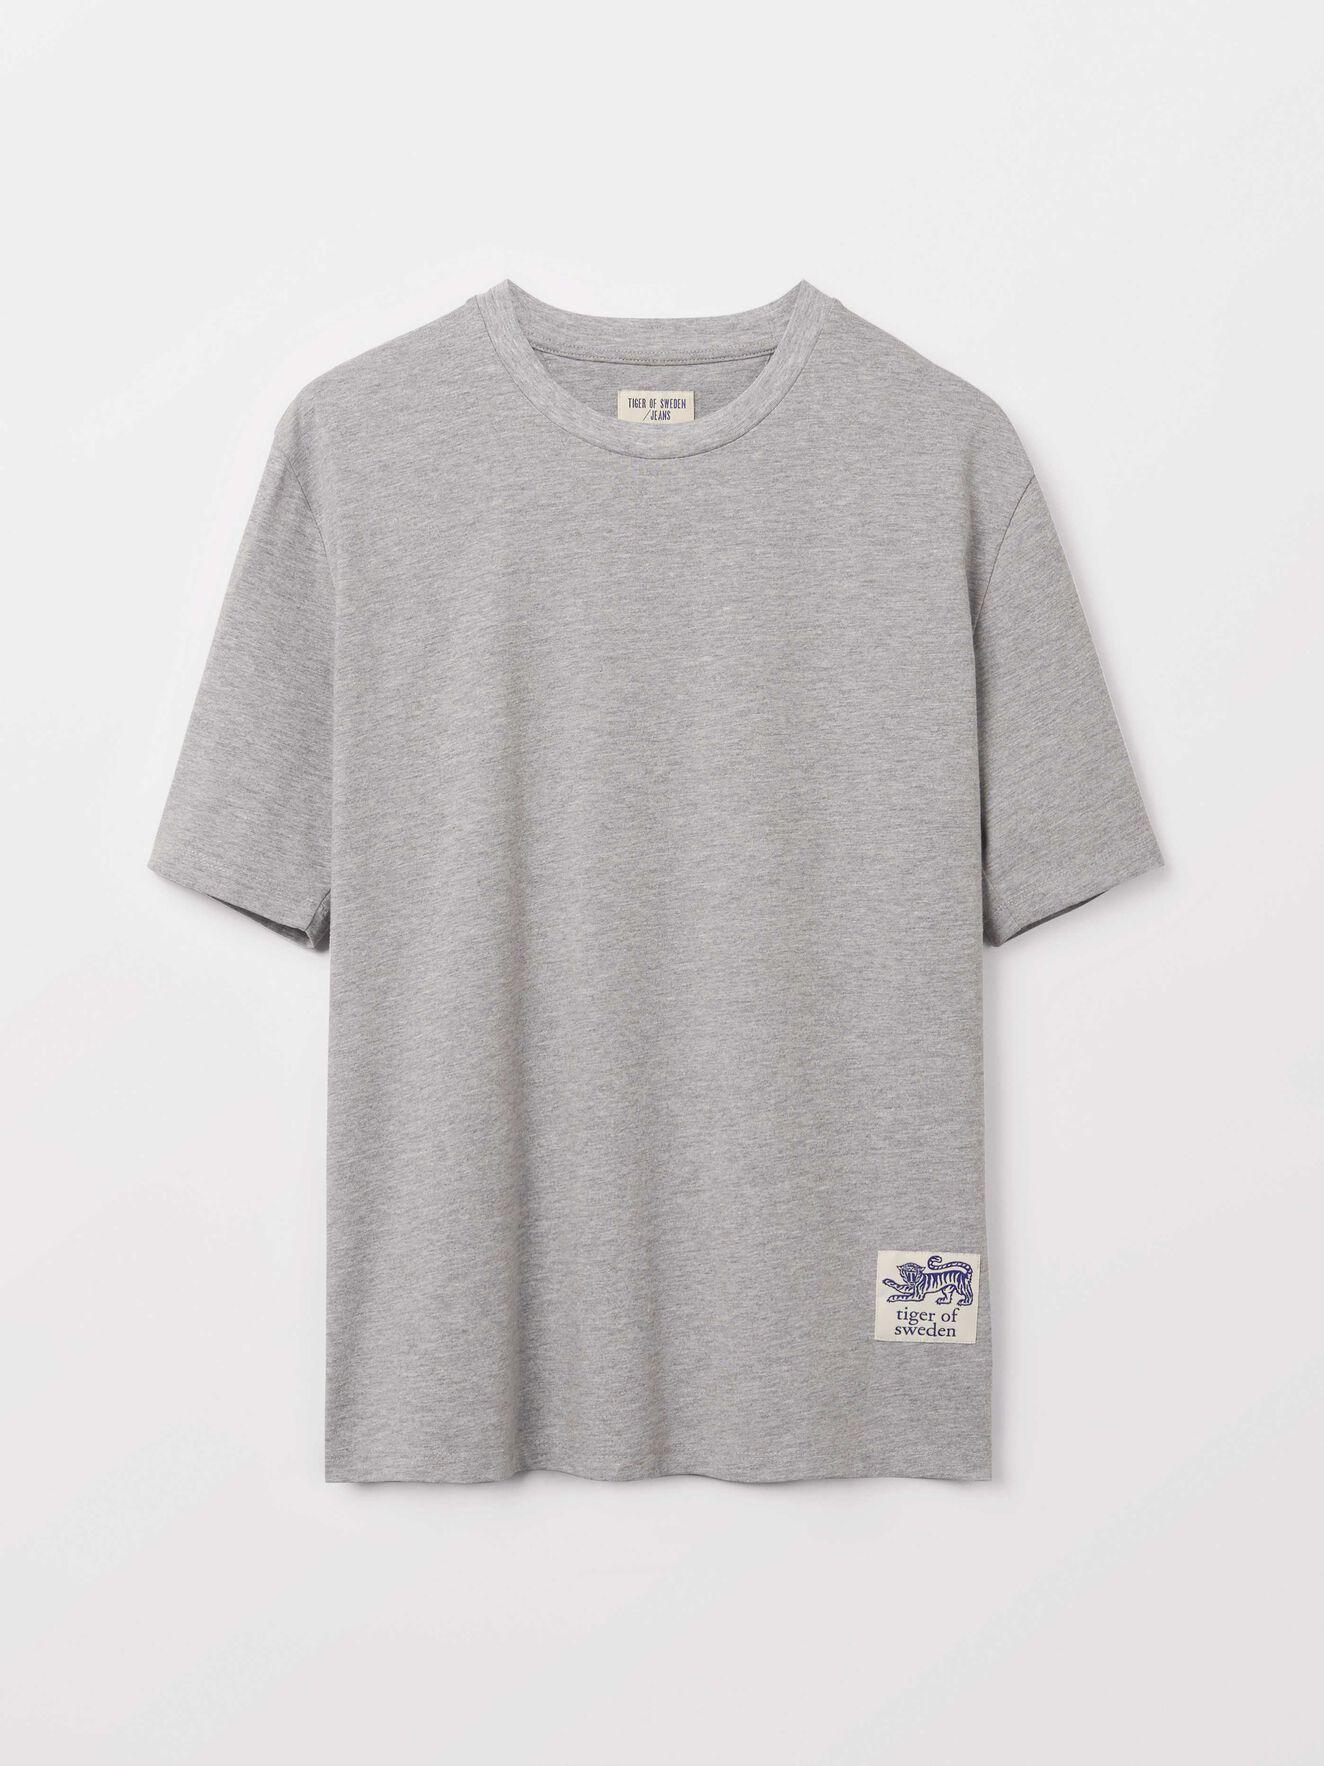 Pro T-Shirt in Med Grey Mel from Tiger of Sweden